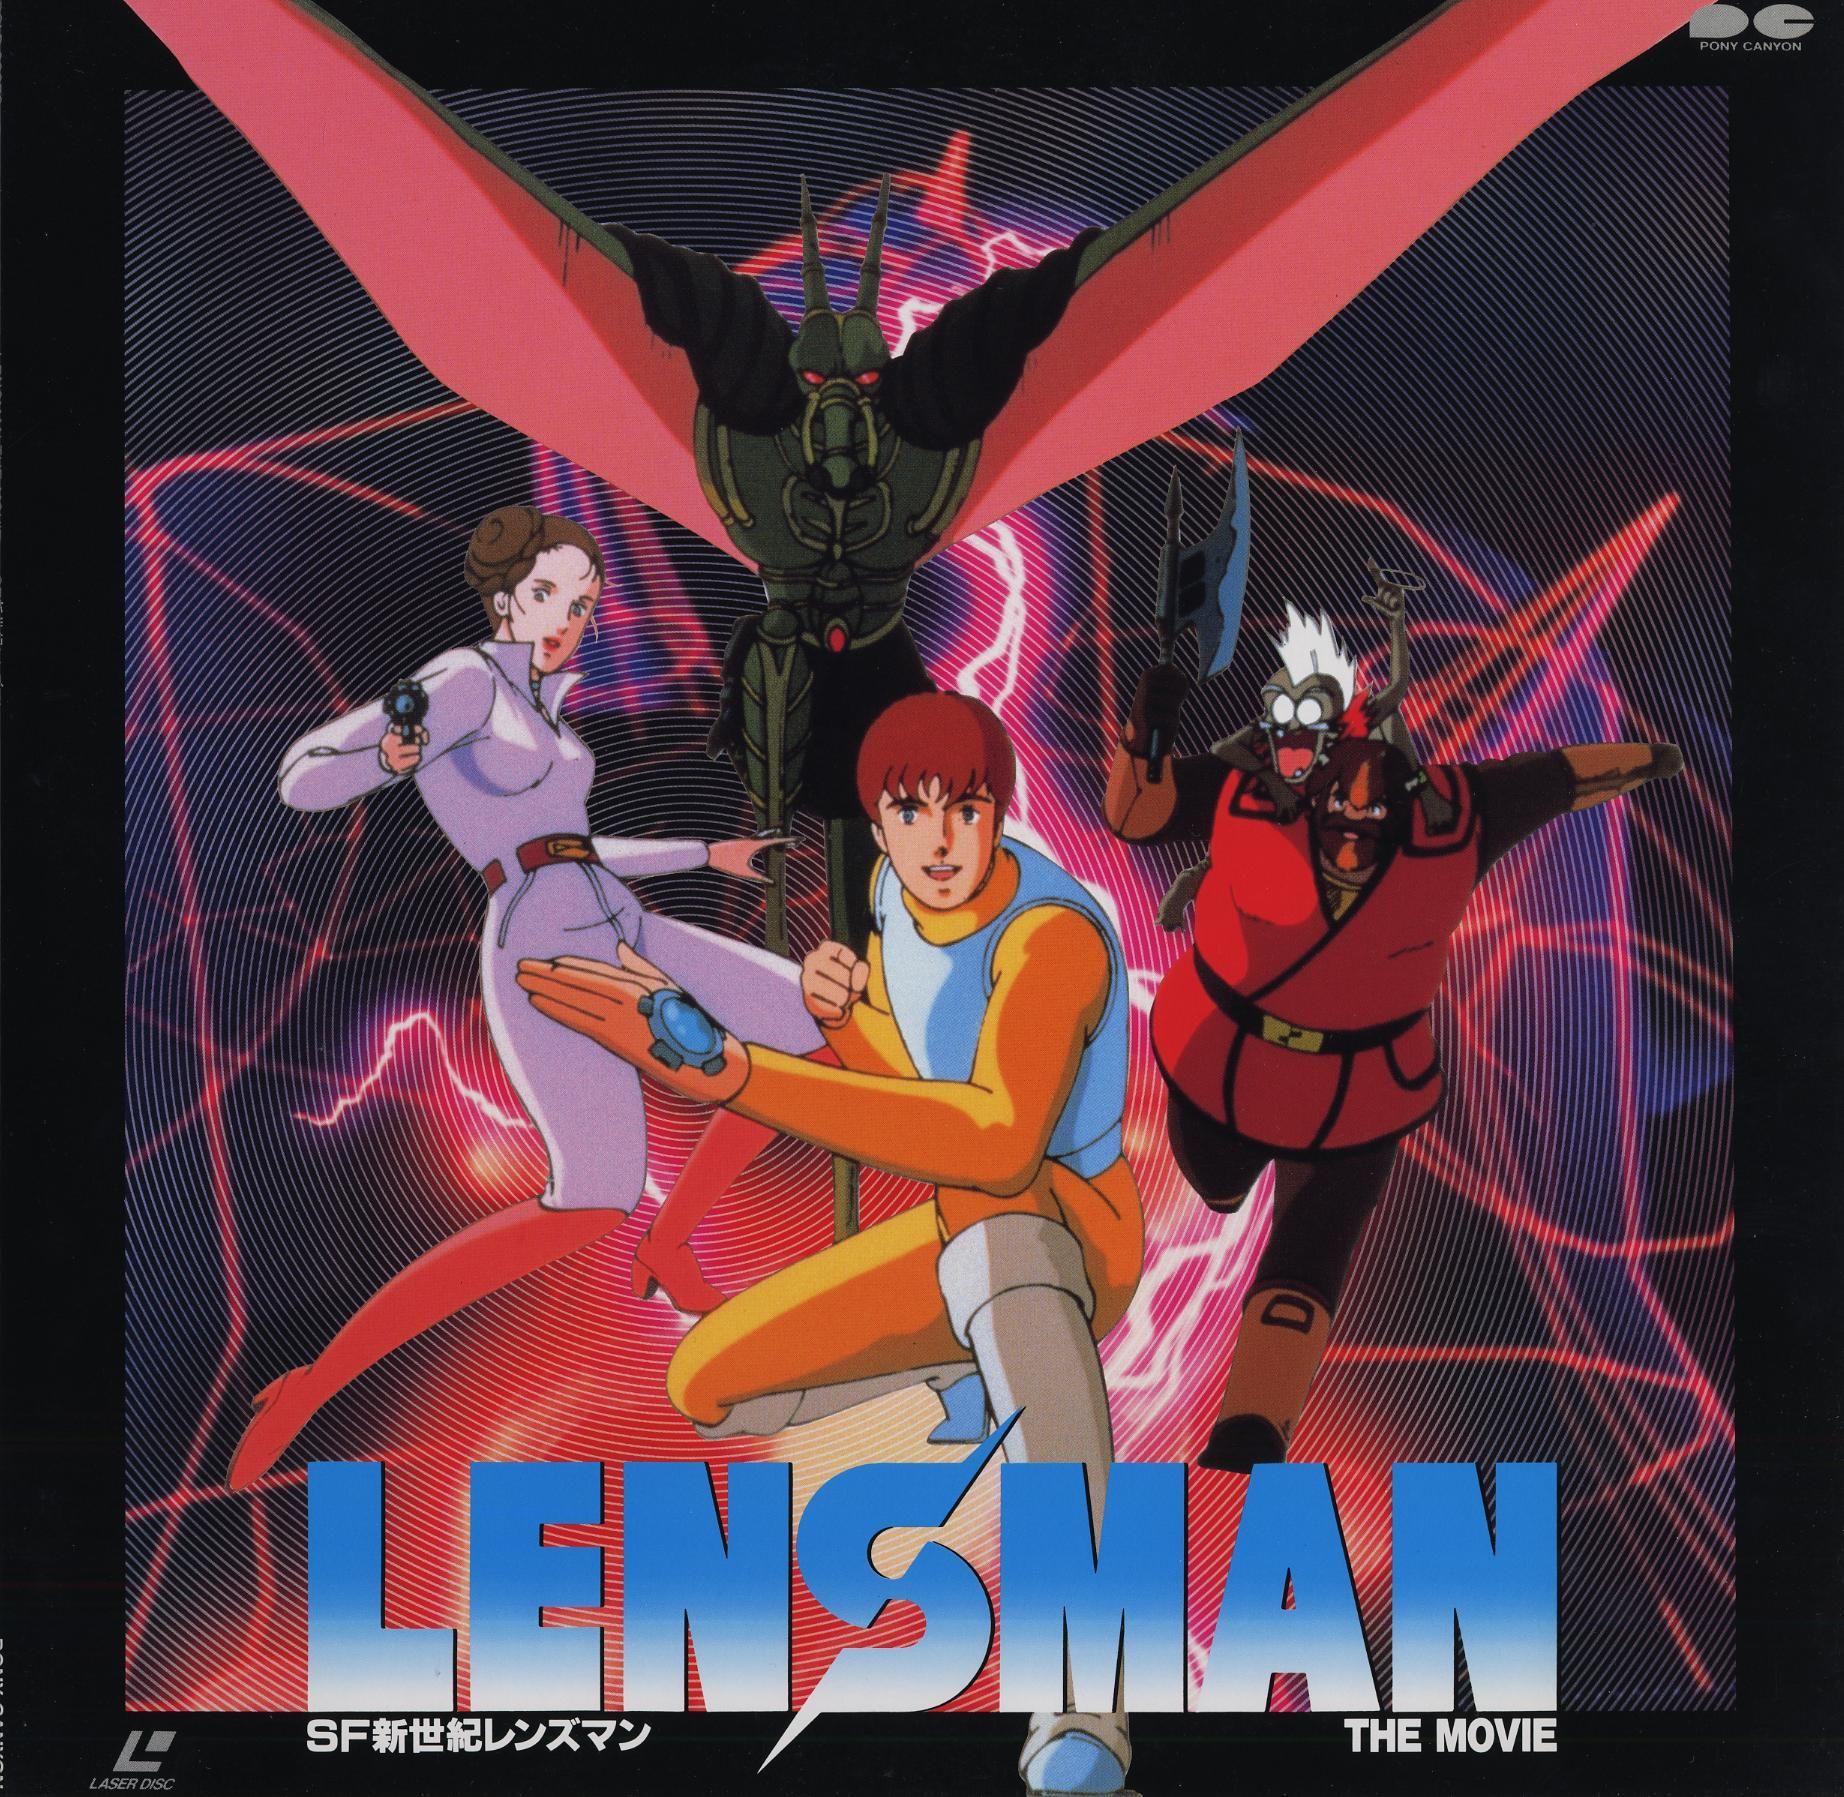 Lensman is one of my child hood favorites anime films